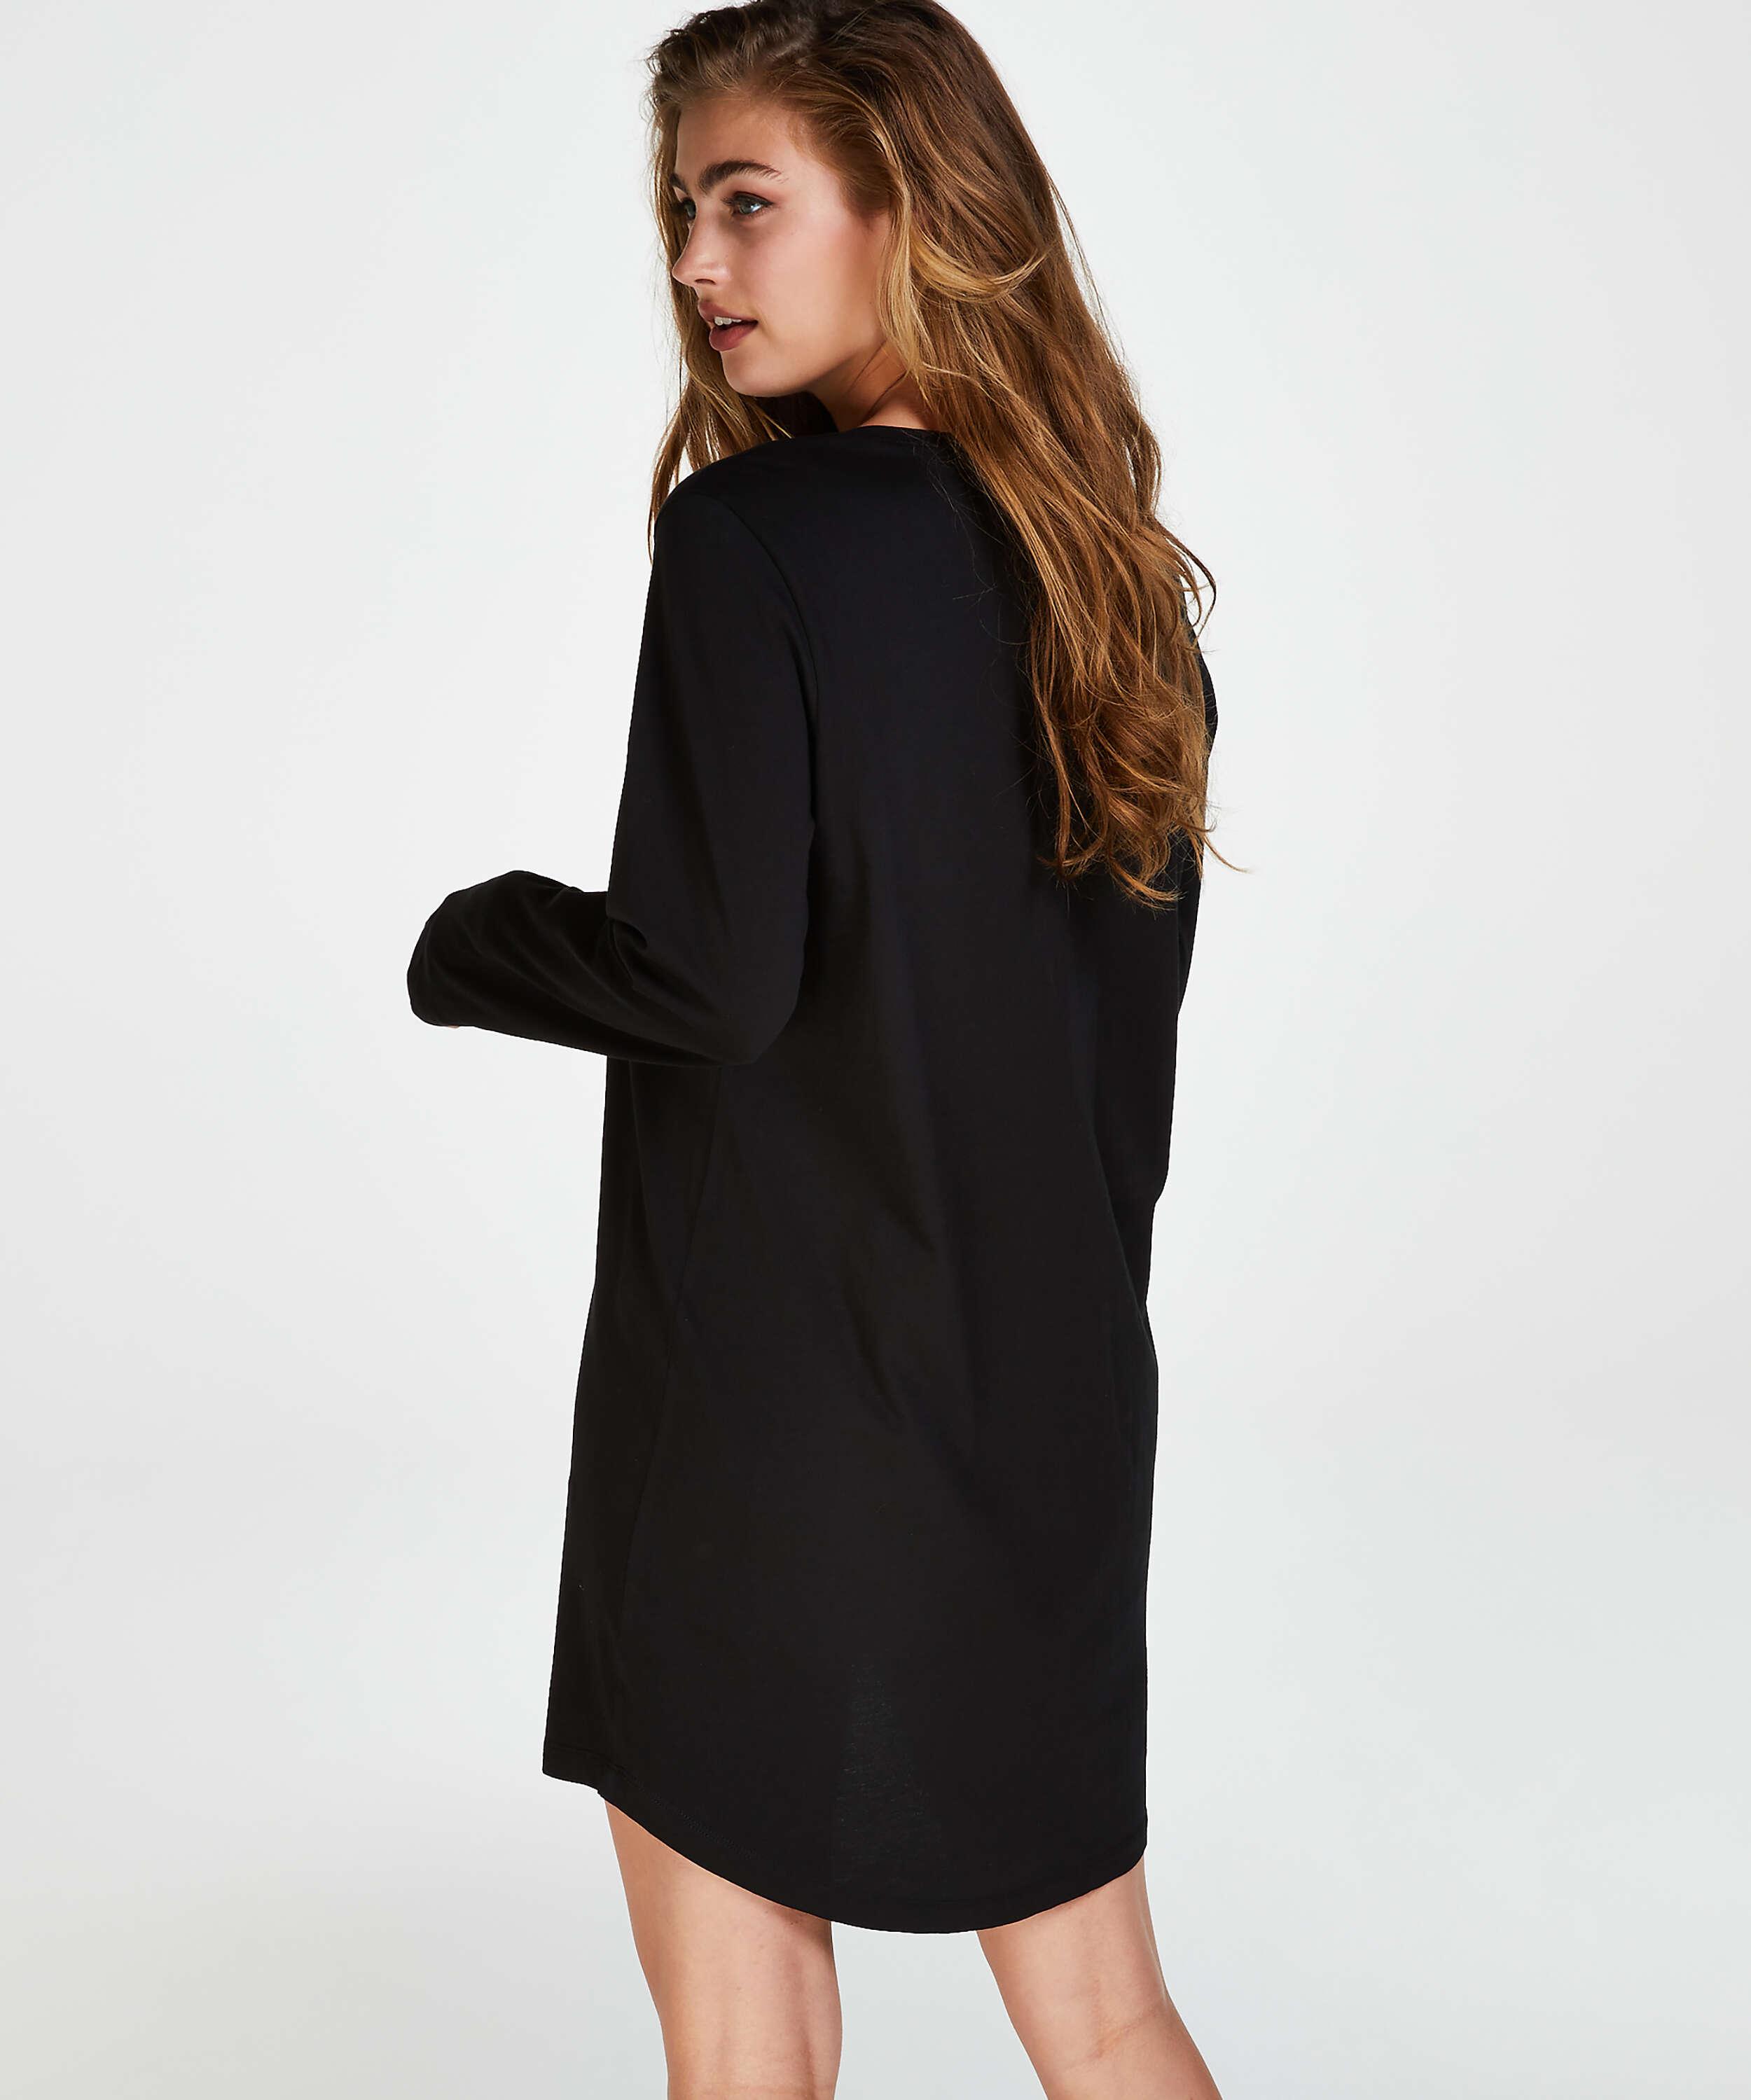 Camisón de cuello redondo, Negro, main